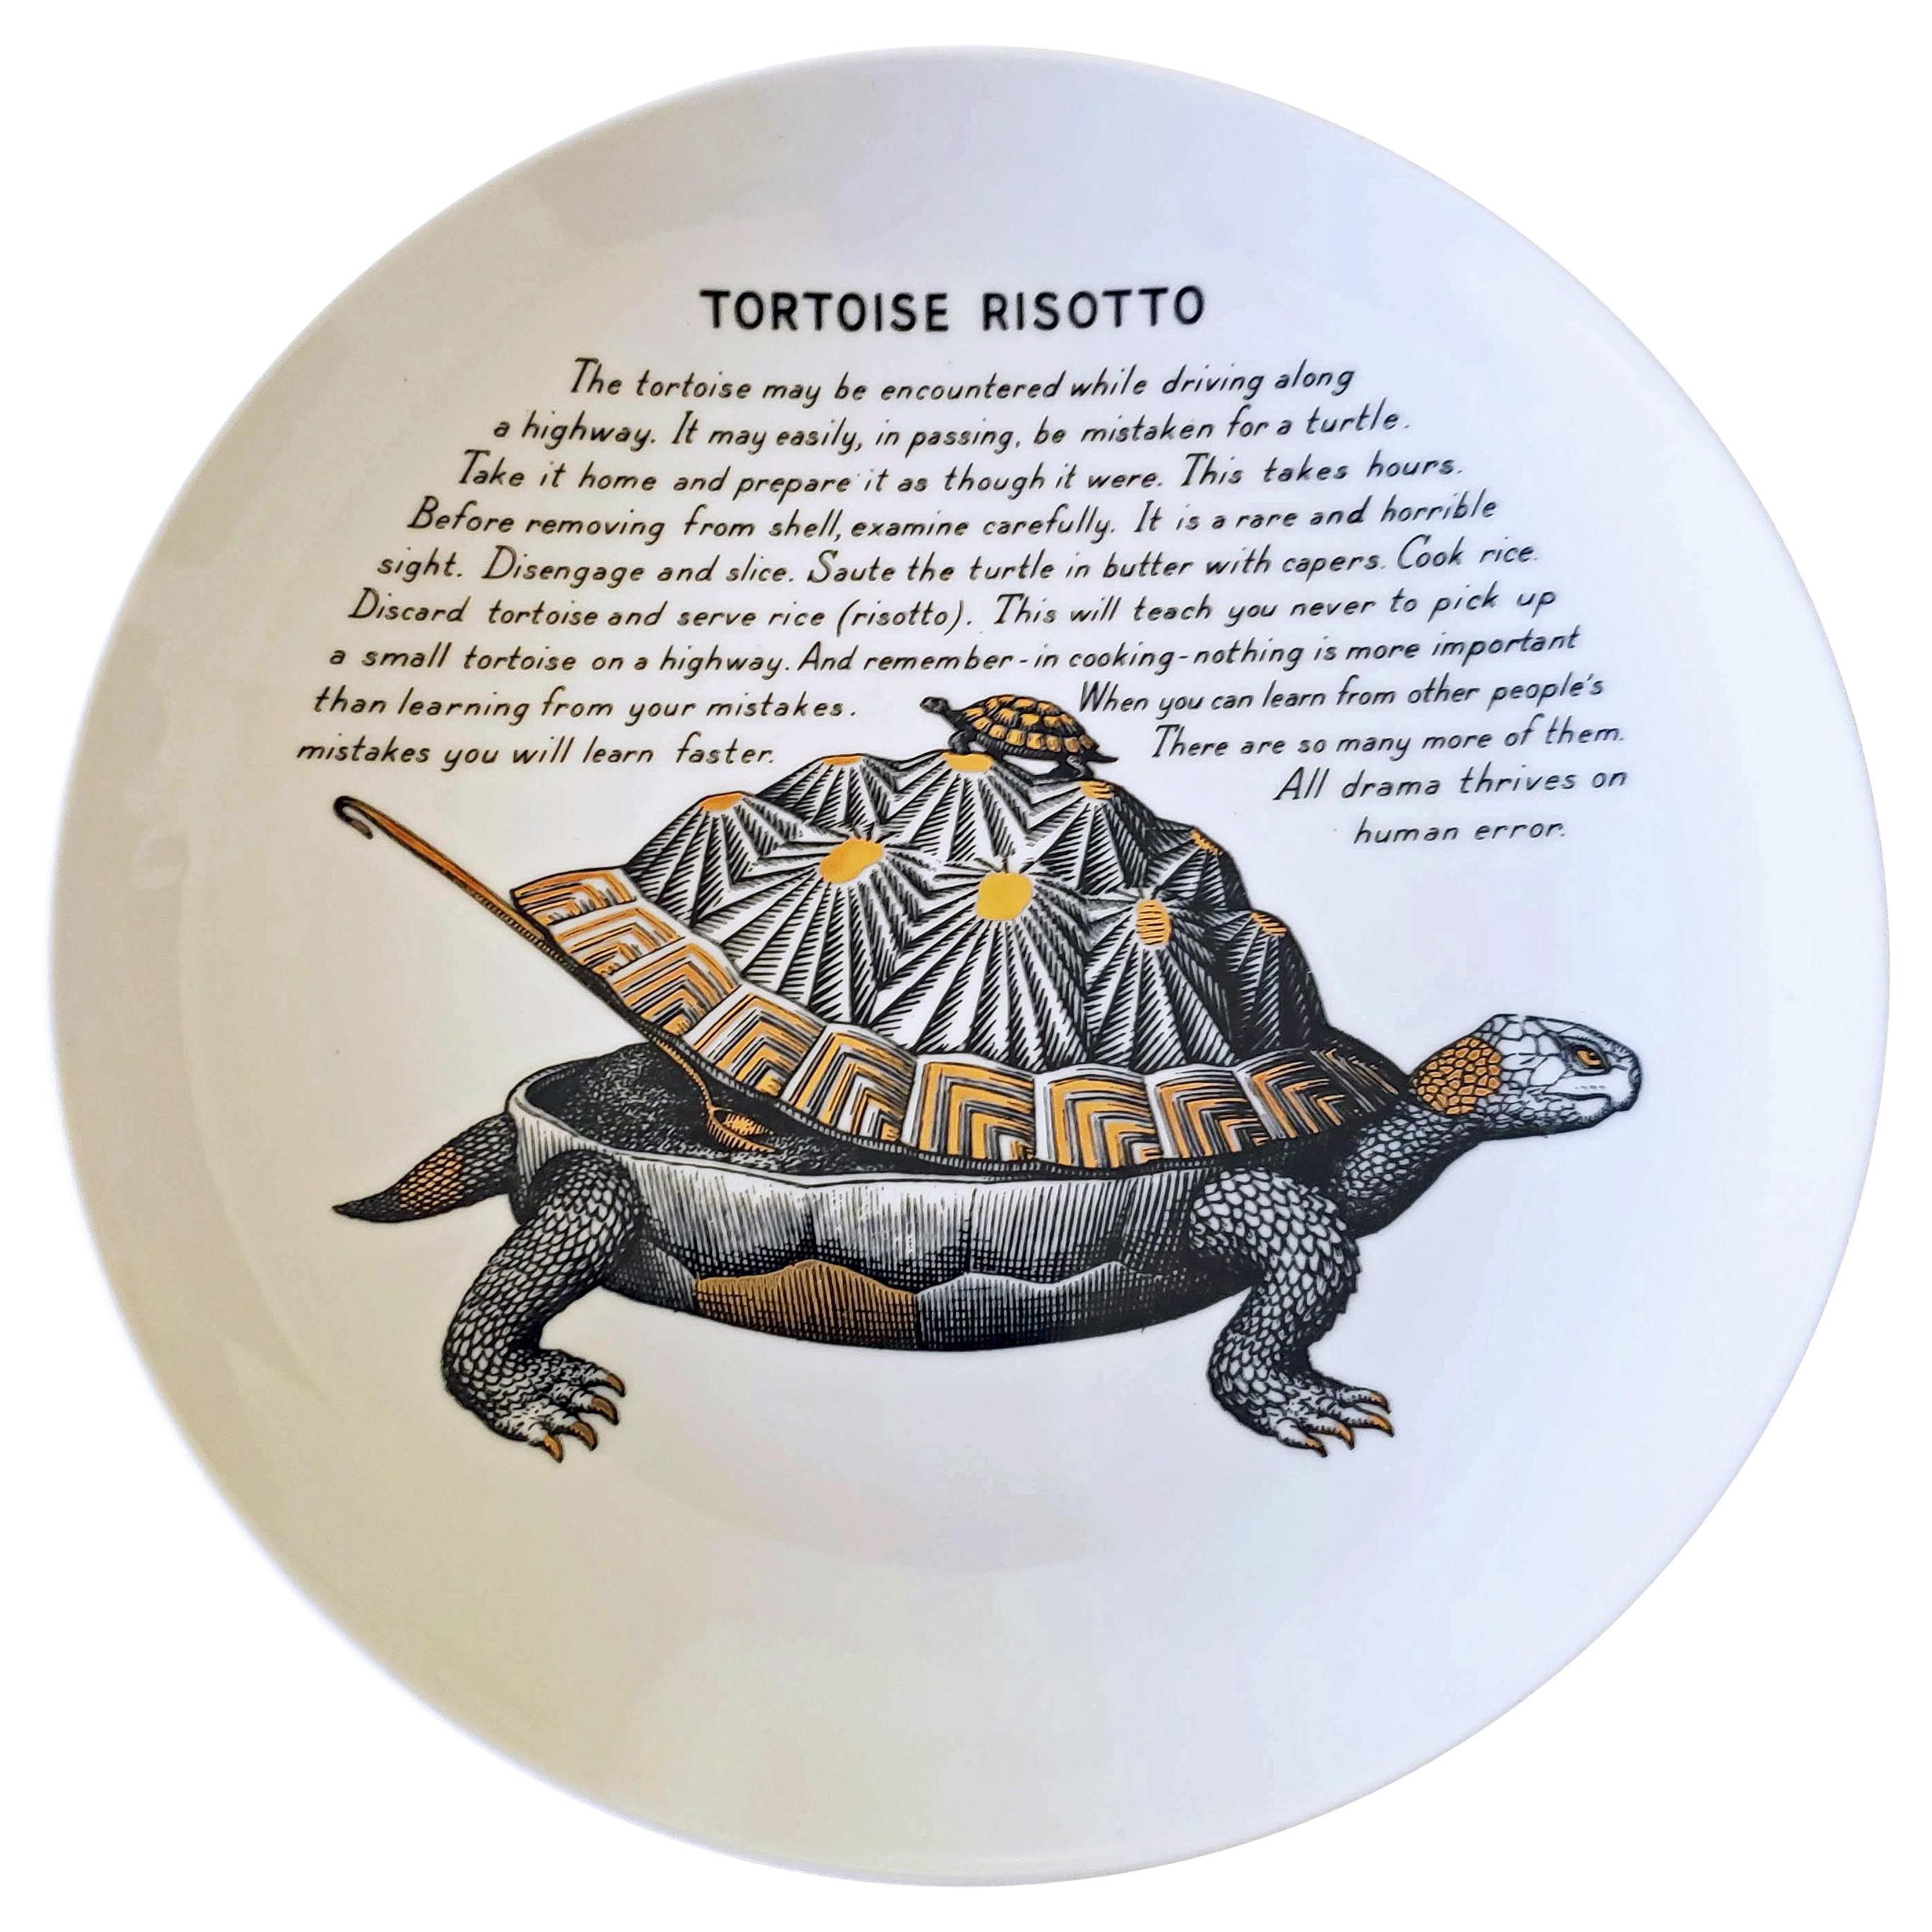 Piero Fornasetti Porcelain Recipe Plate, Tortoise Risotto, Fleming Joffe